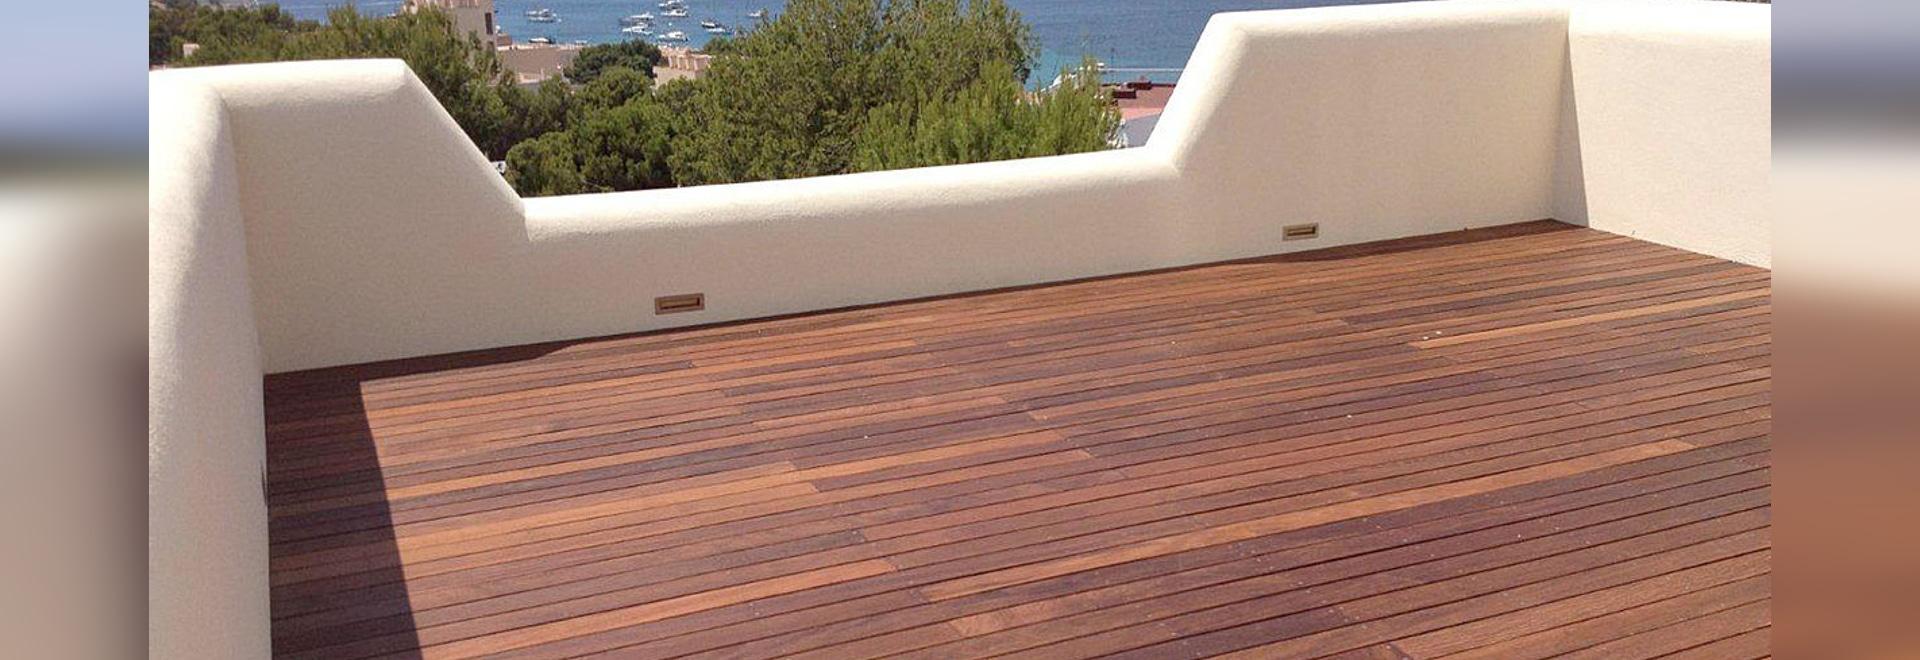 Awesome Terrazzo Sul Tetto Photos - Modern Home Design - orangetech.us